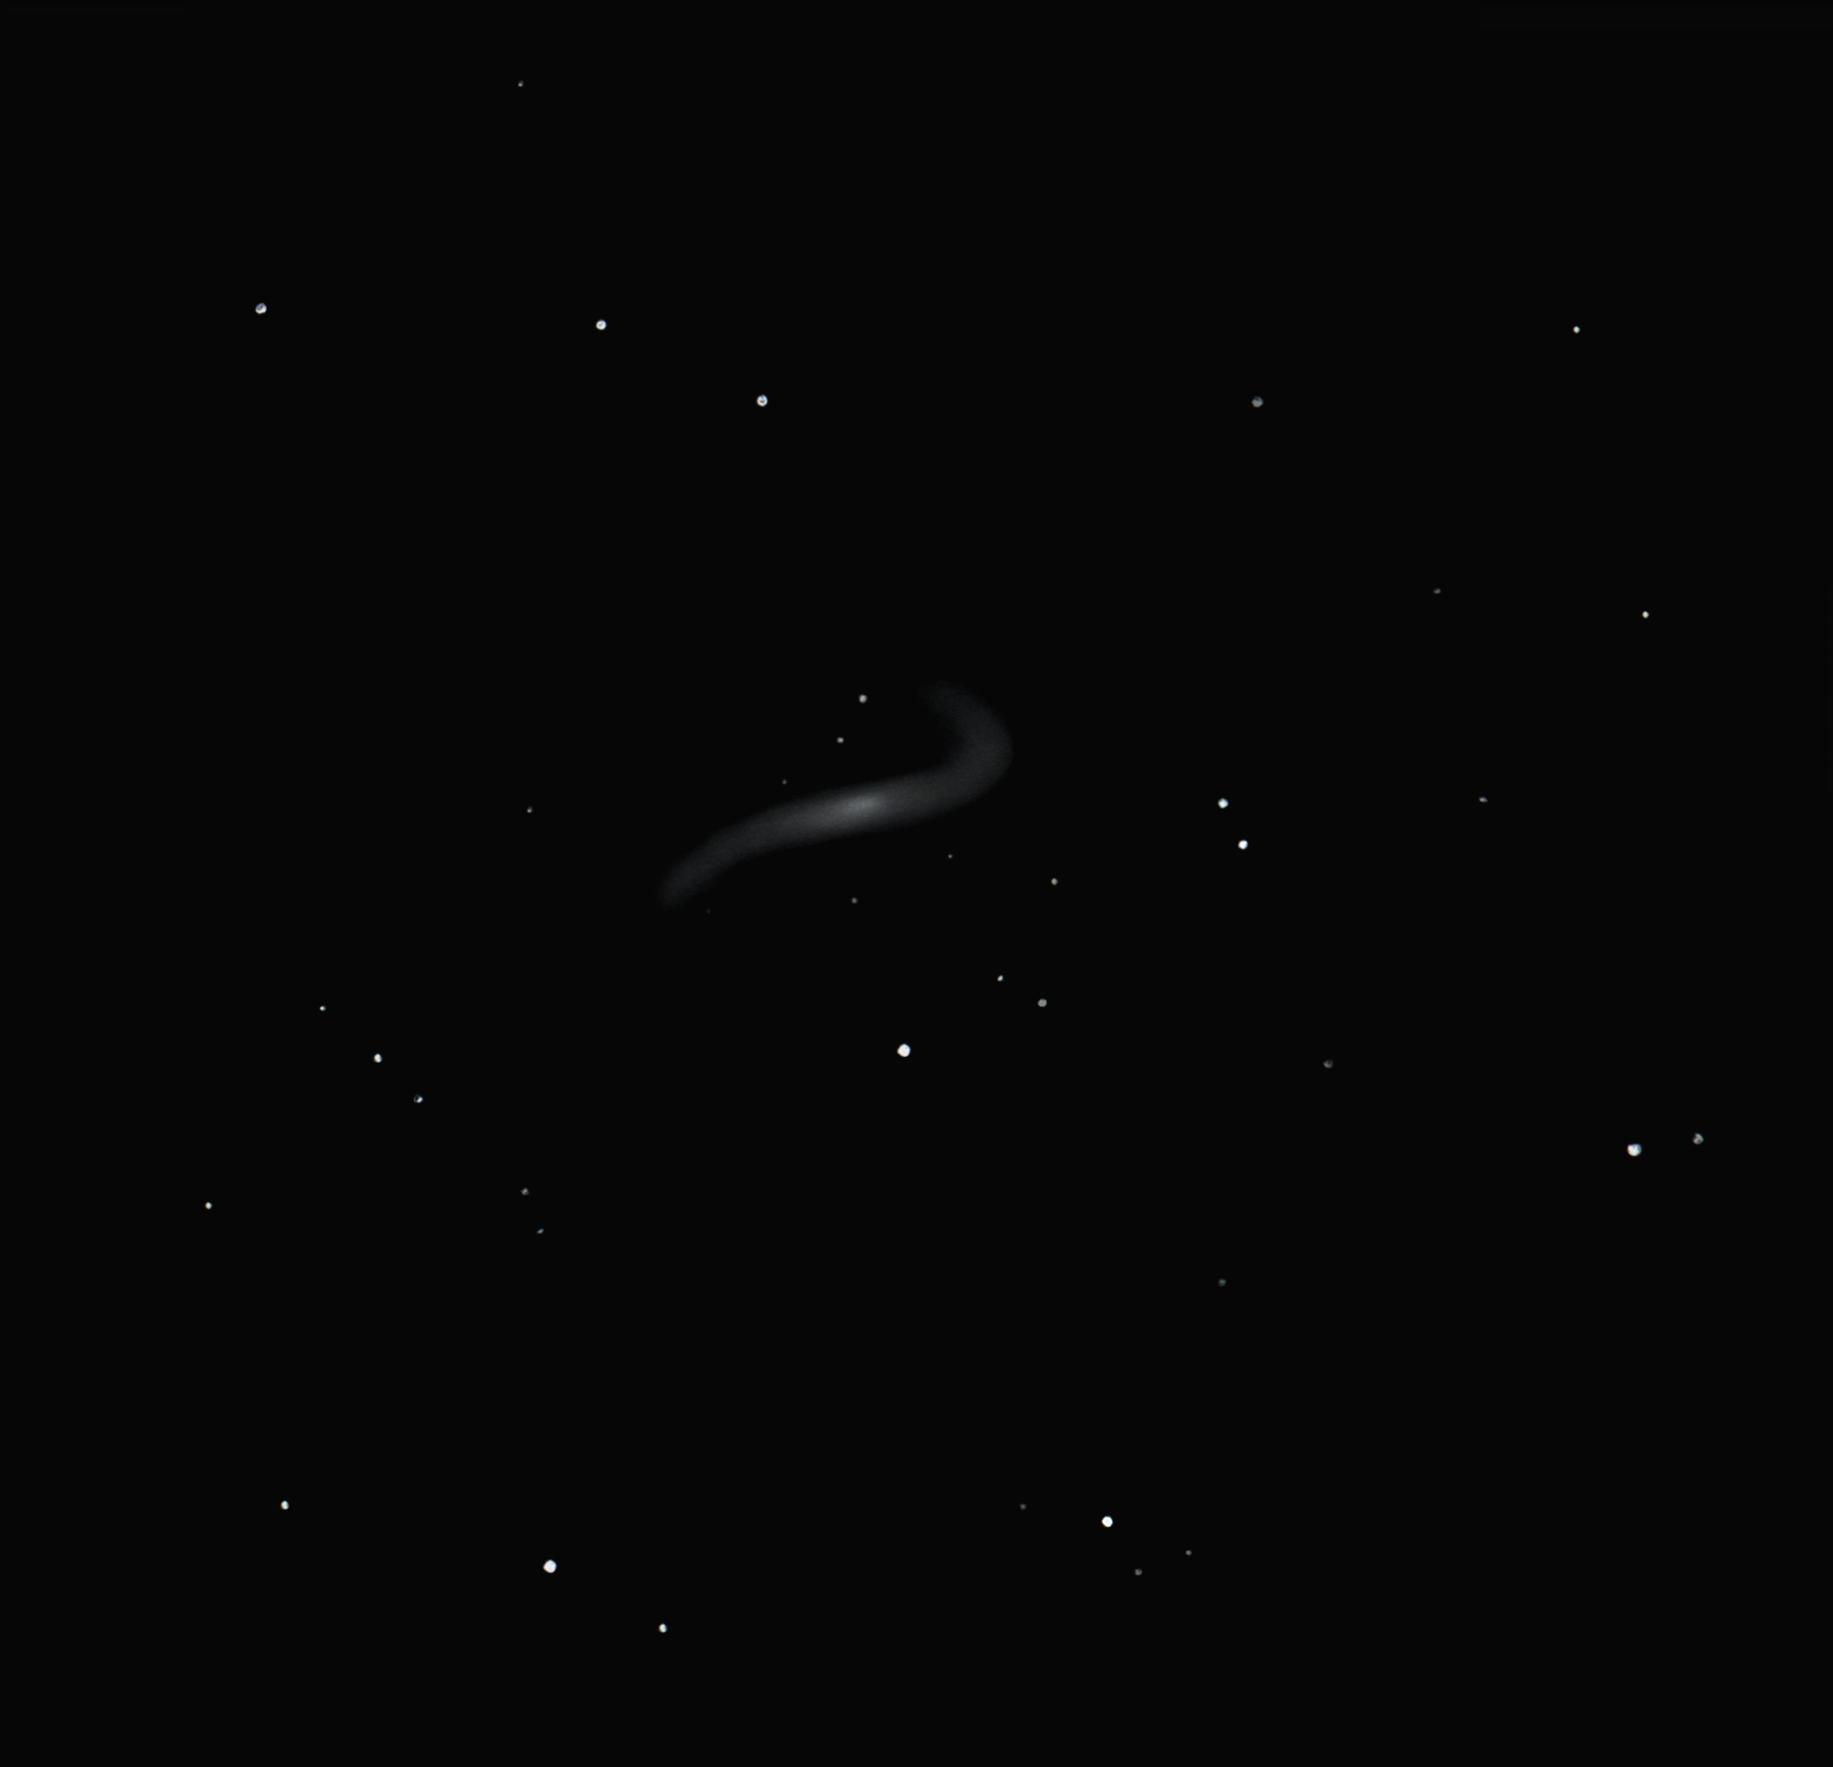 ngc 925 galaxy